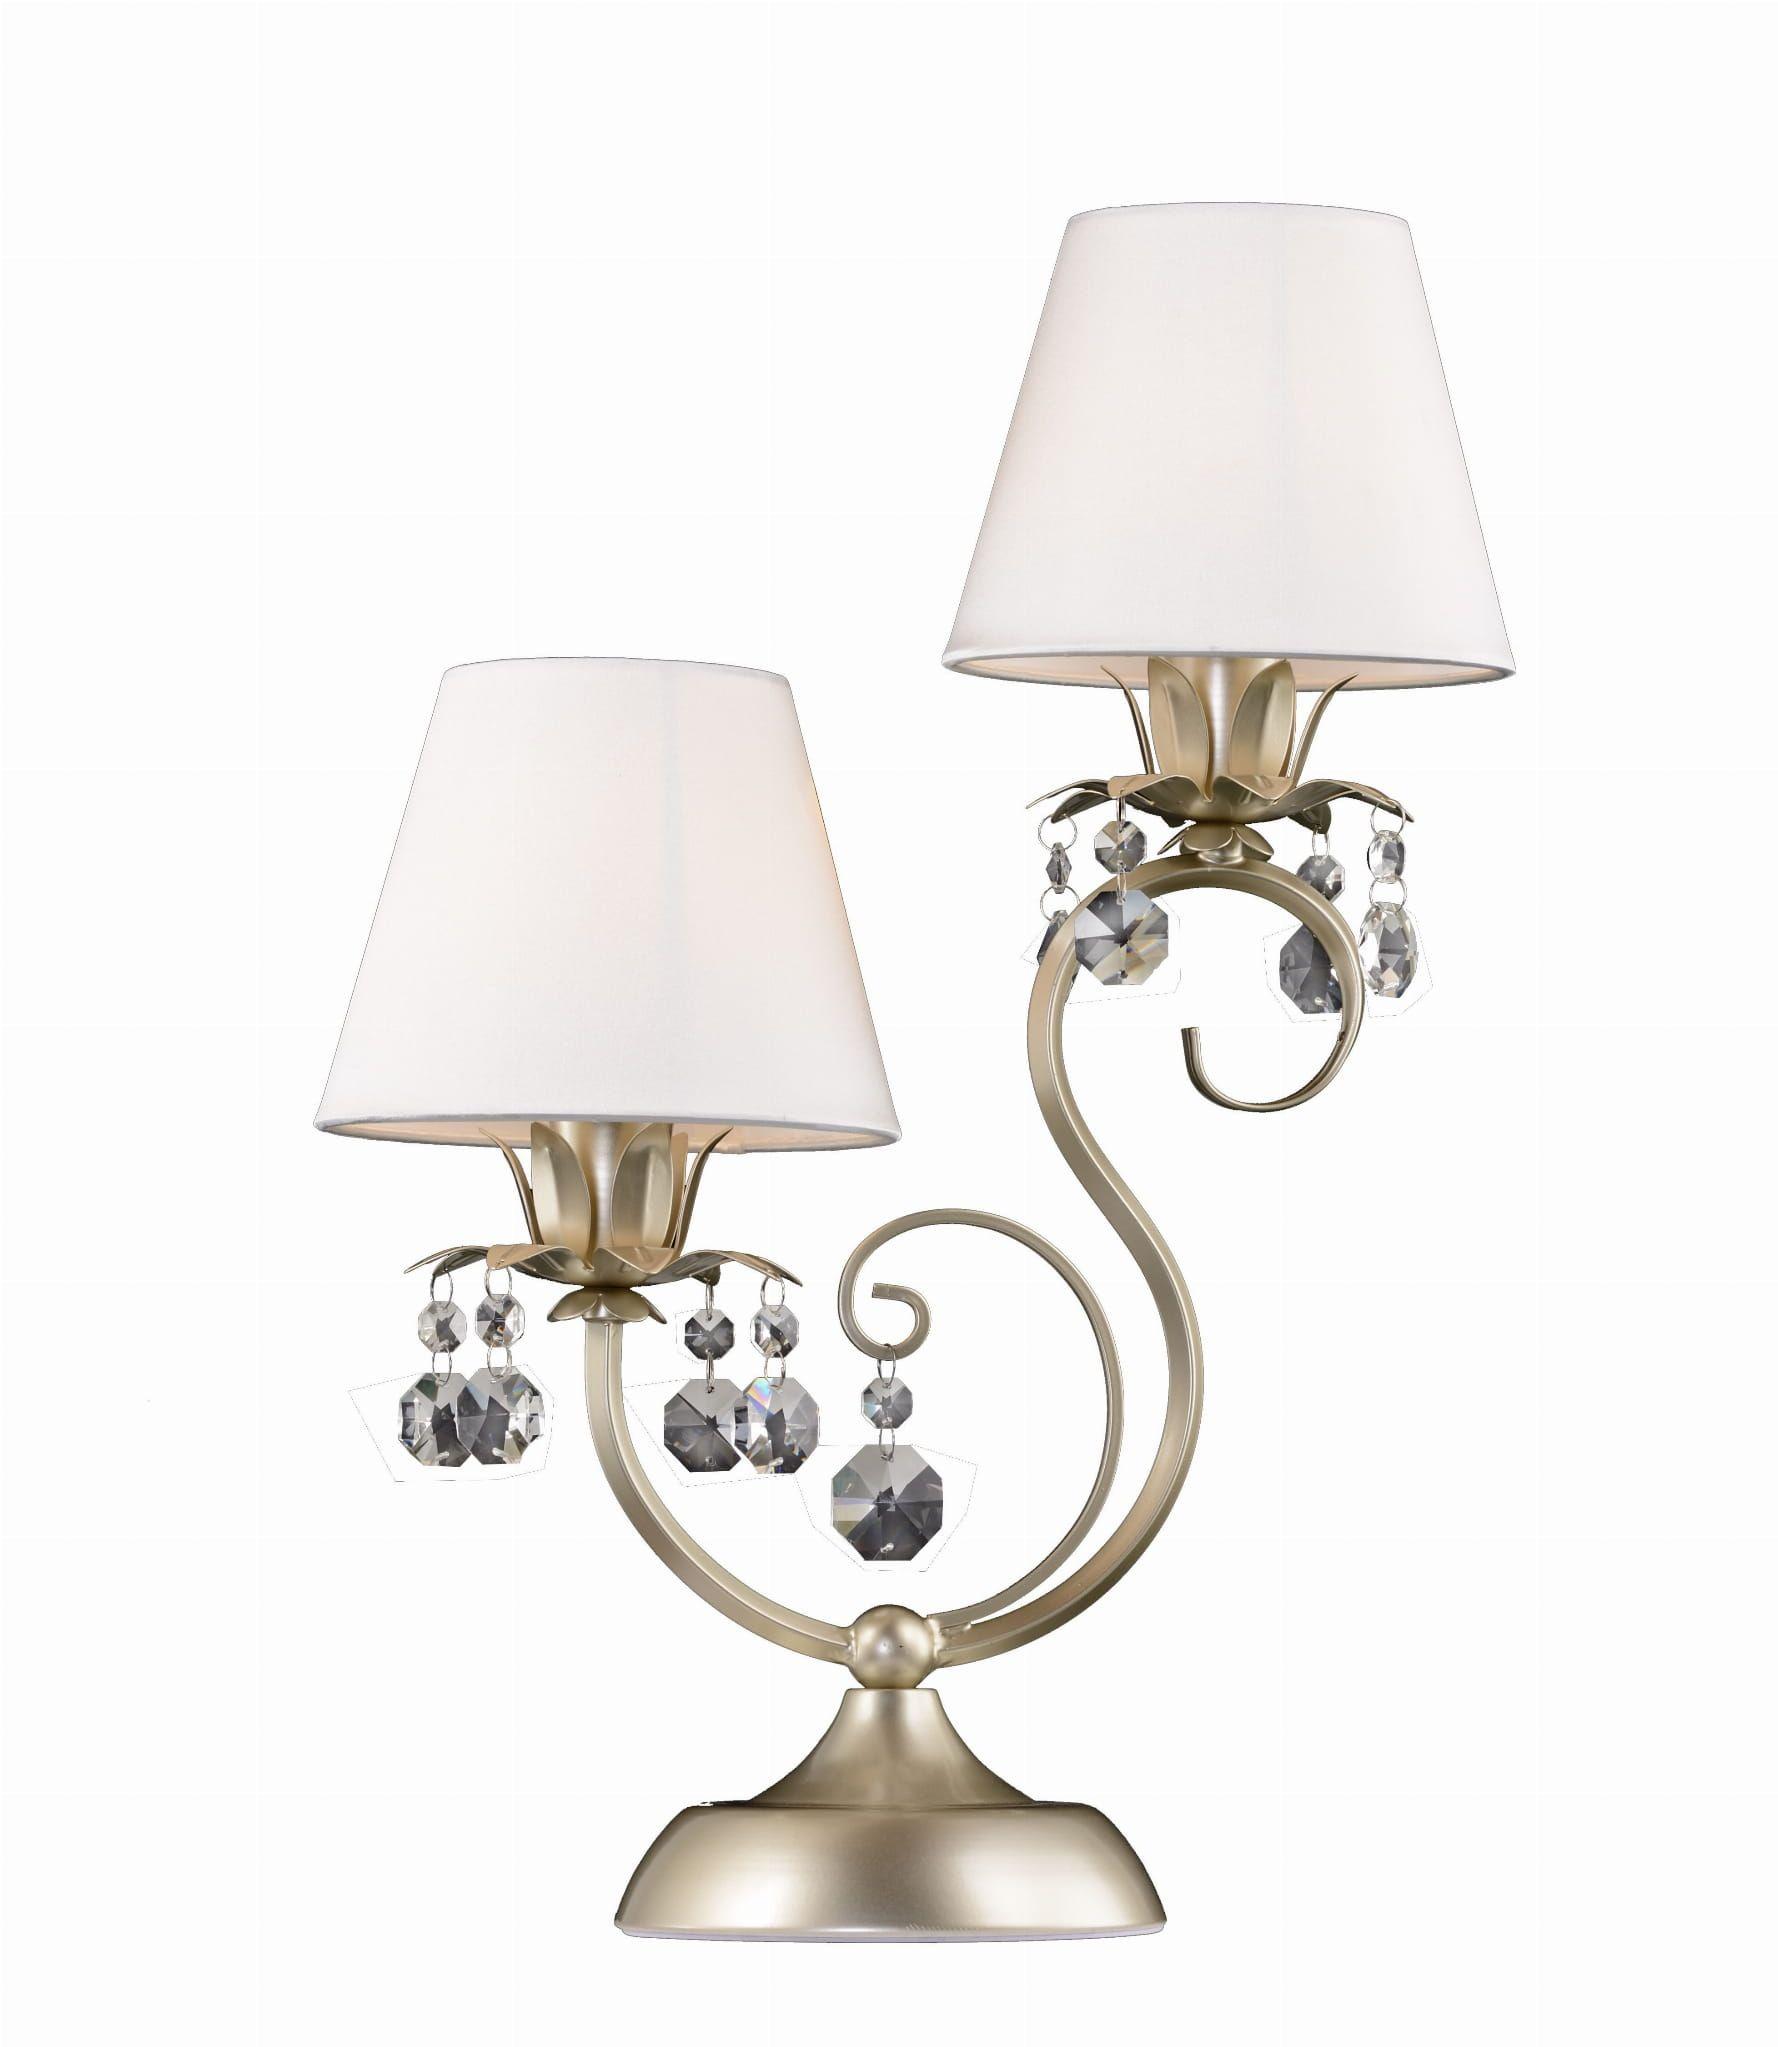 Lampa Stolowa Baron 2x40w Abazury Krysztalki Italian Gold Wall Lights Sconces Home Decor